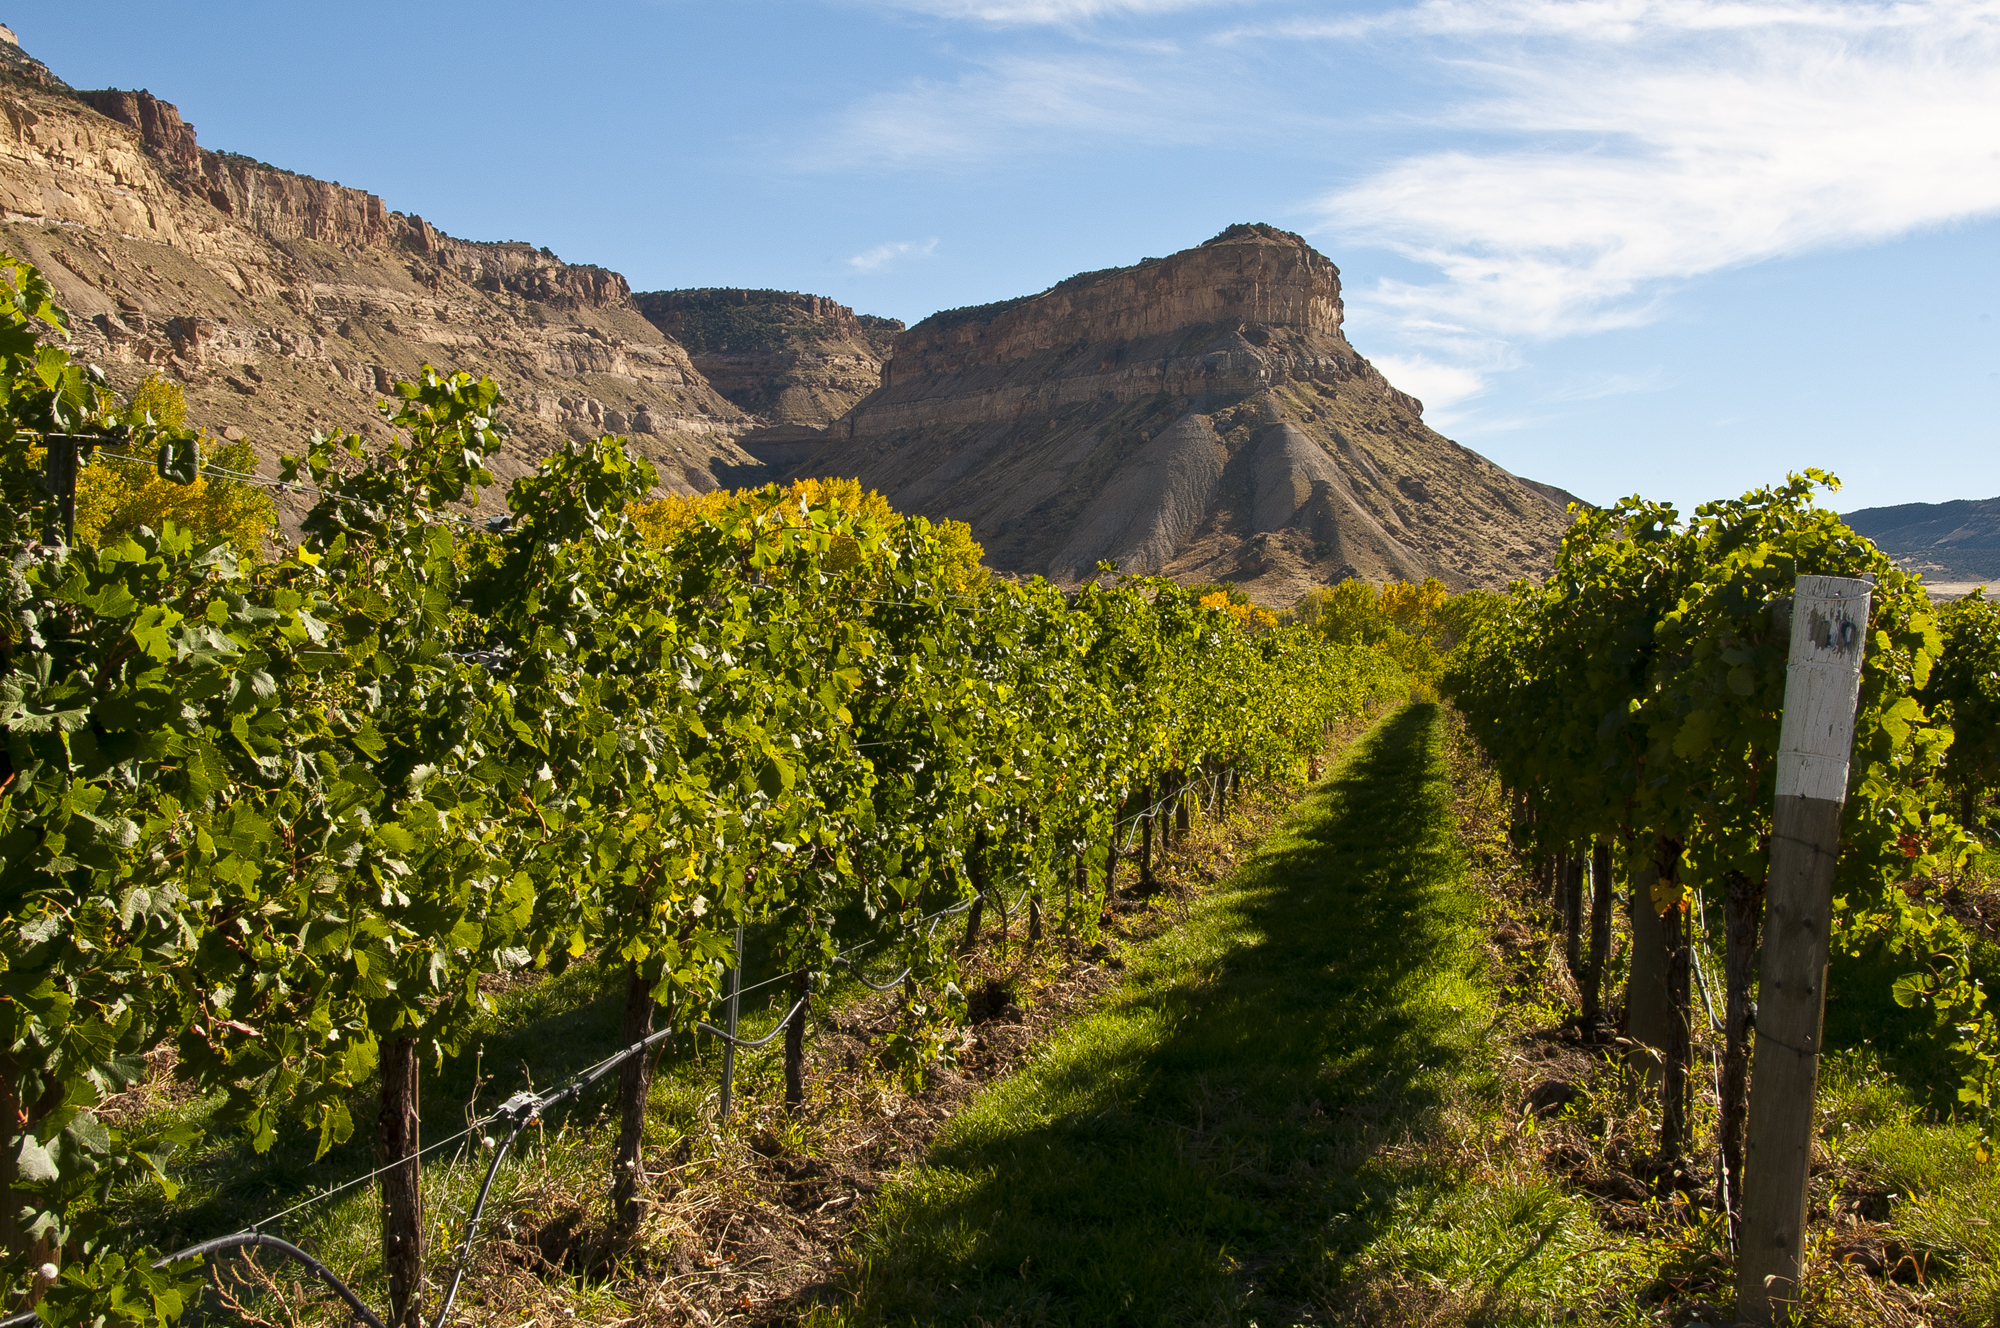 Palisade vineyard